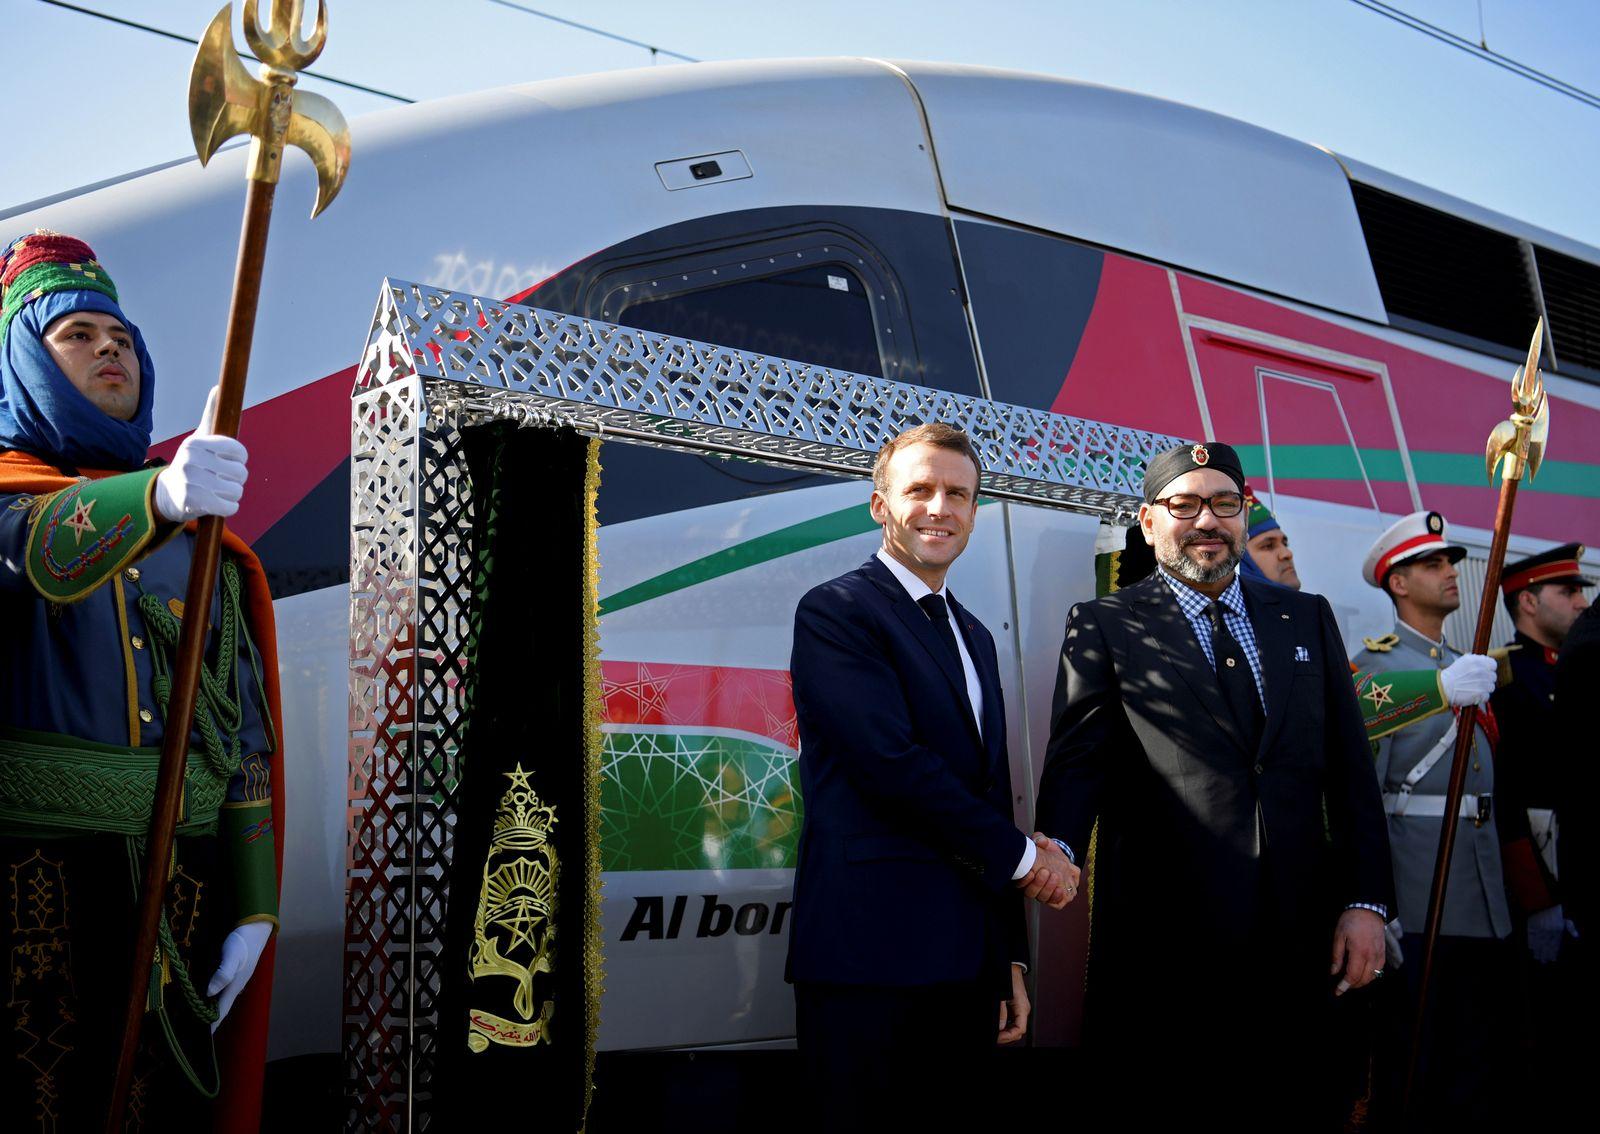 Marokko / Rabat / Macron / König Mohammed VI / Hochgeschwindigkeitszug